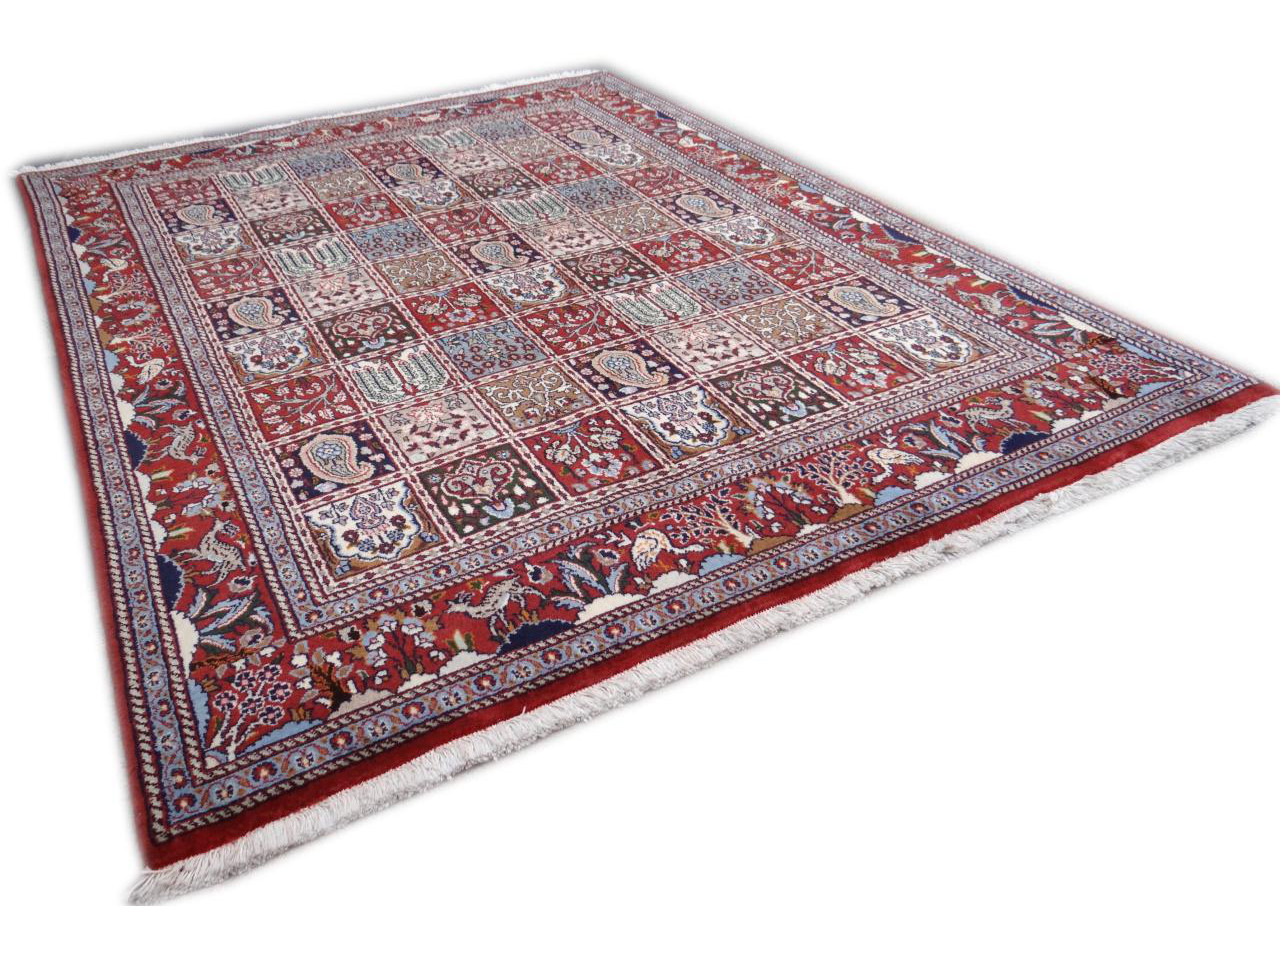 moud jardin tapis persans n 2499 195x146cm. Black Bedroom Furniture Sets. Home Design Ideas